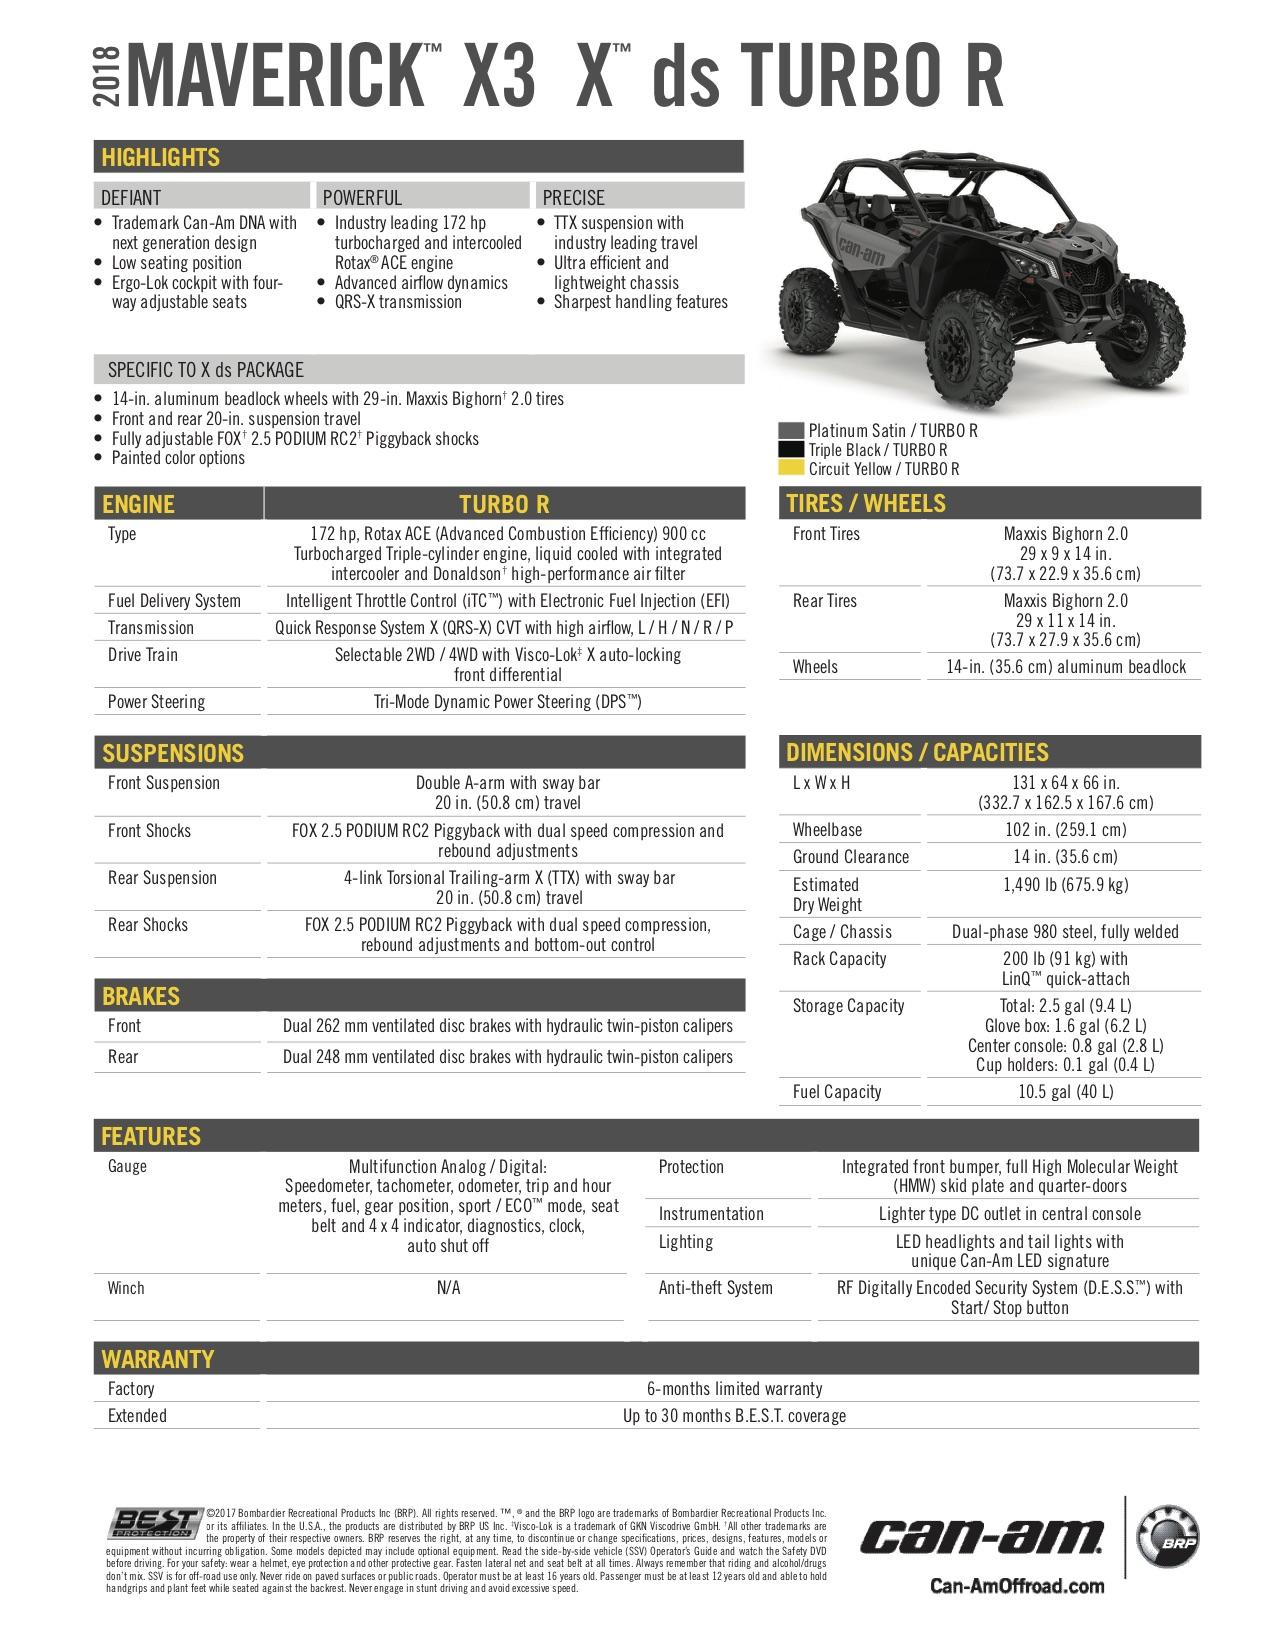 2018 Can-Am SSV Maverick X3 X DS Turbo R — Bancroft Sport & Marine